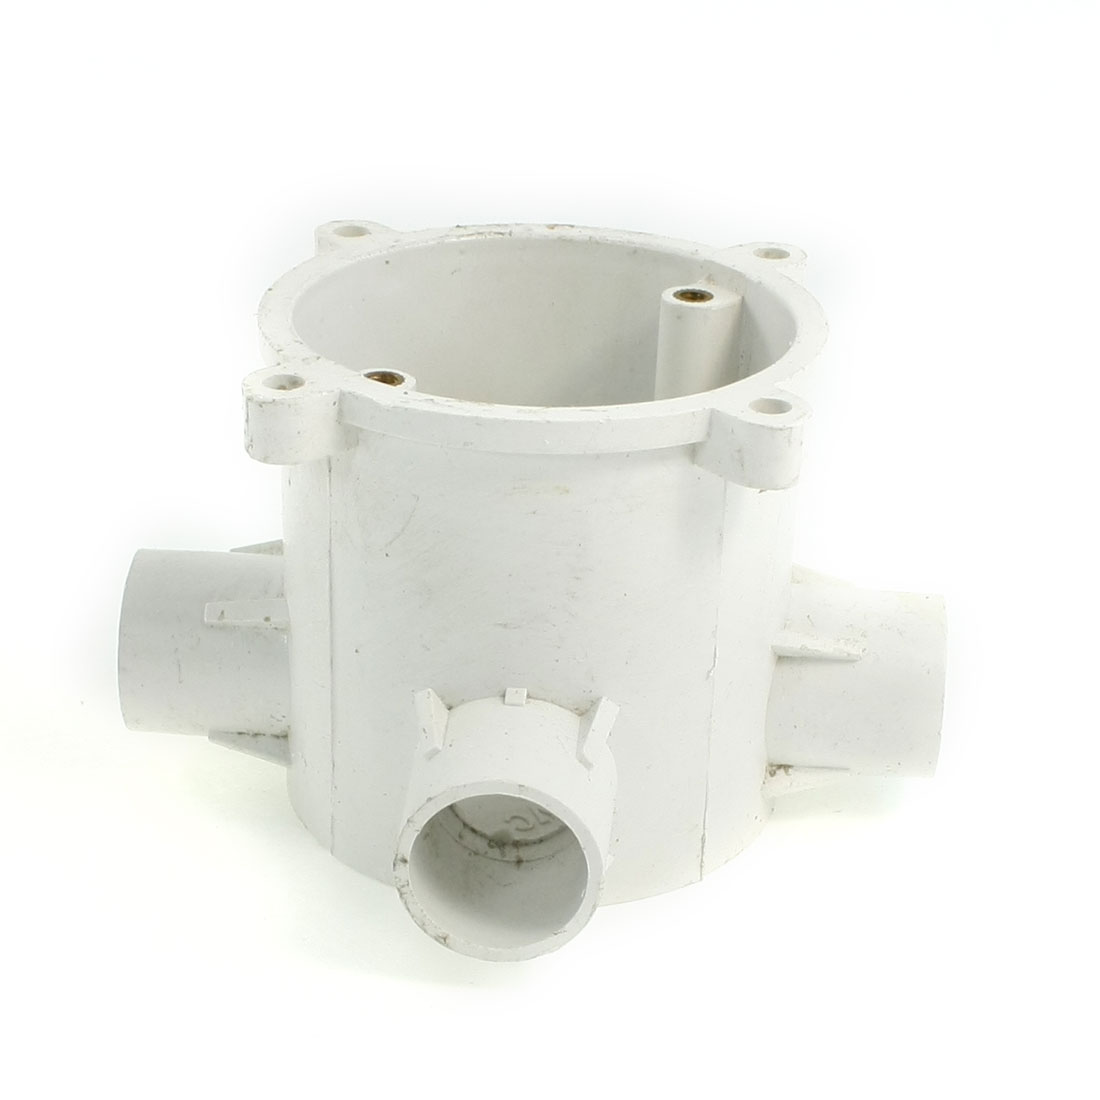 White PVC Flush Type Wall Mounted 3 Way Round Junction Box Case